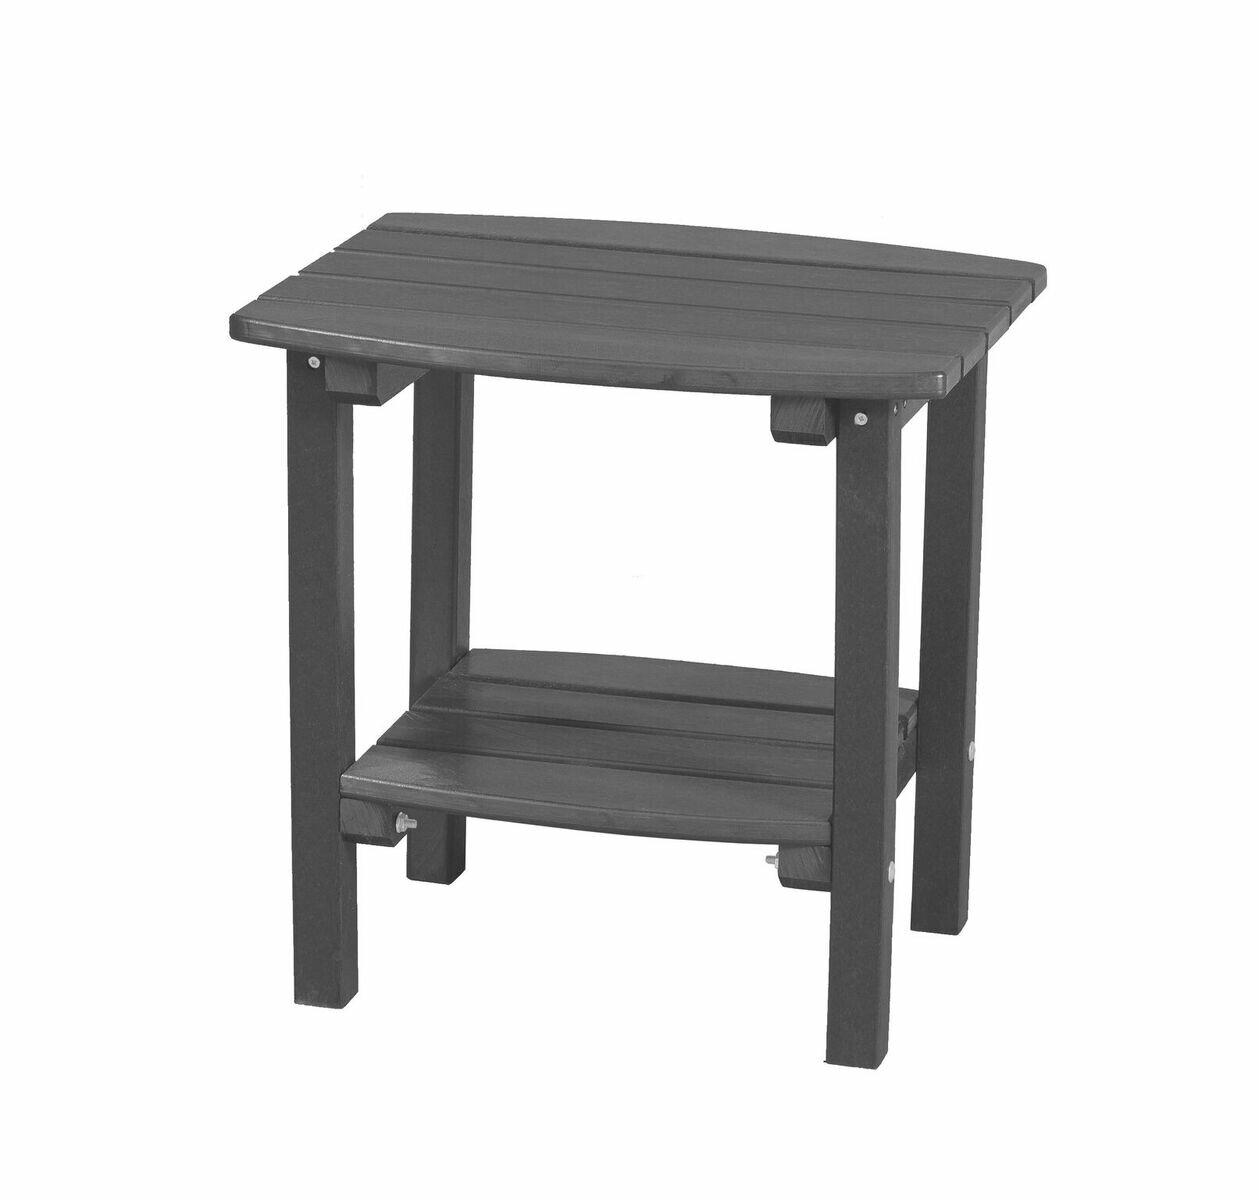 Similar patio tables below